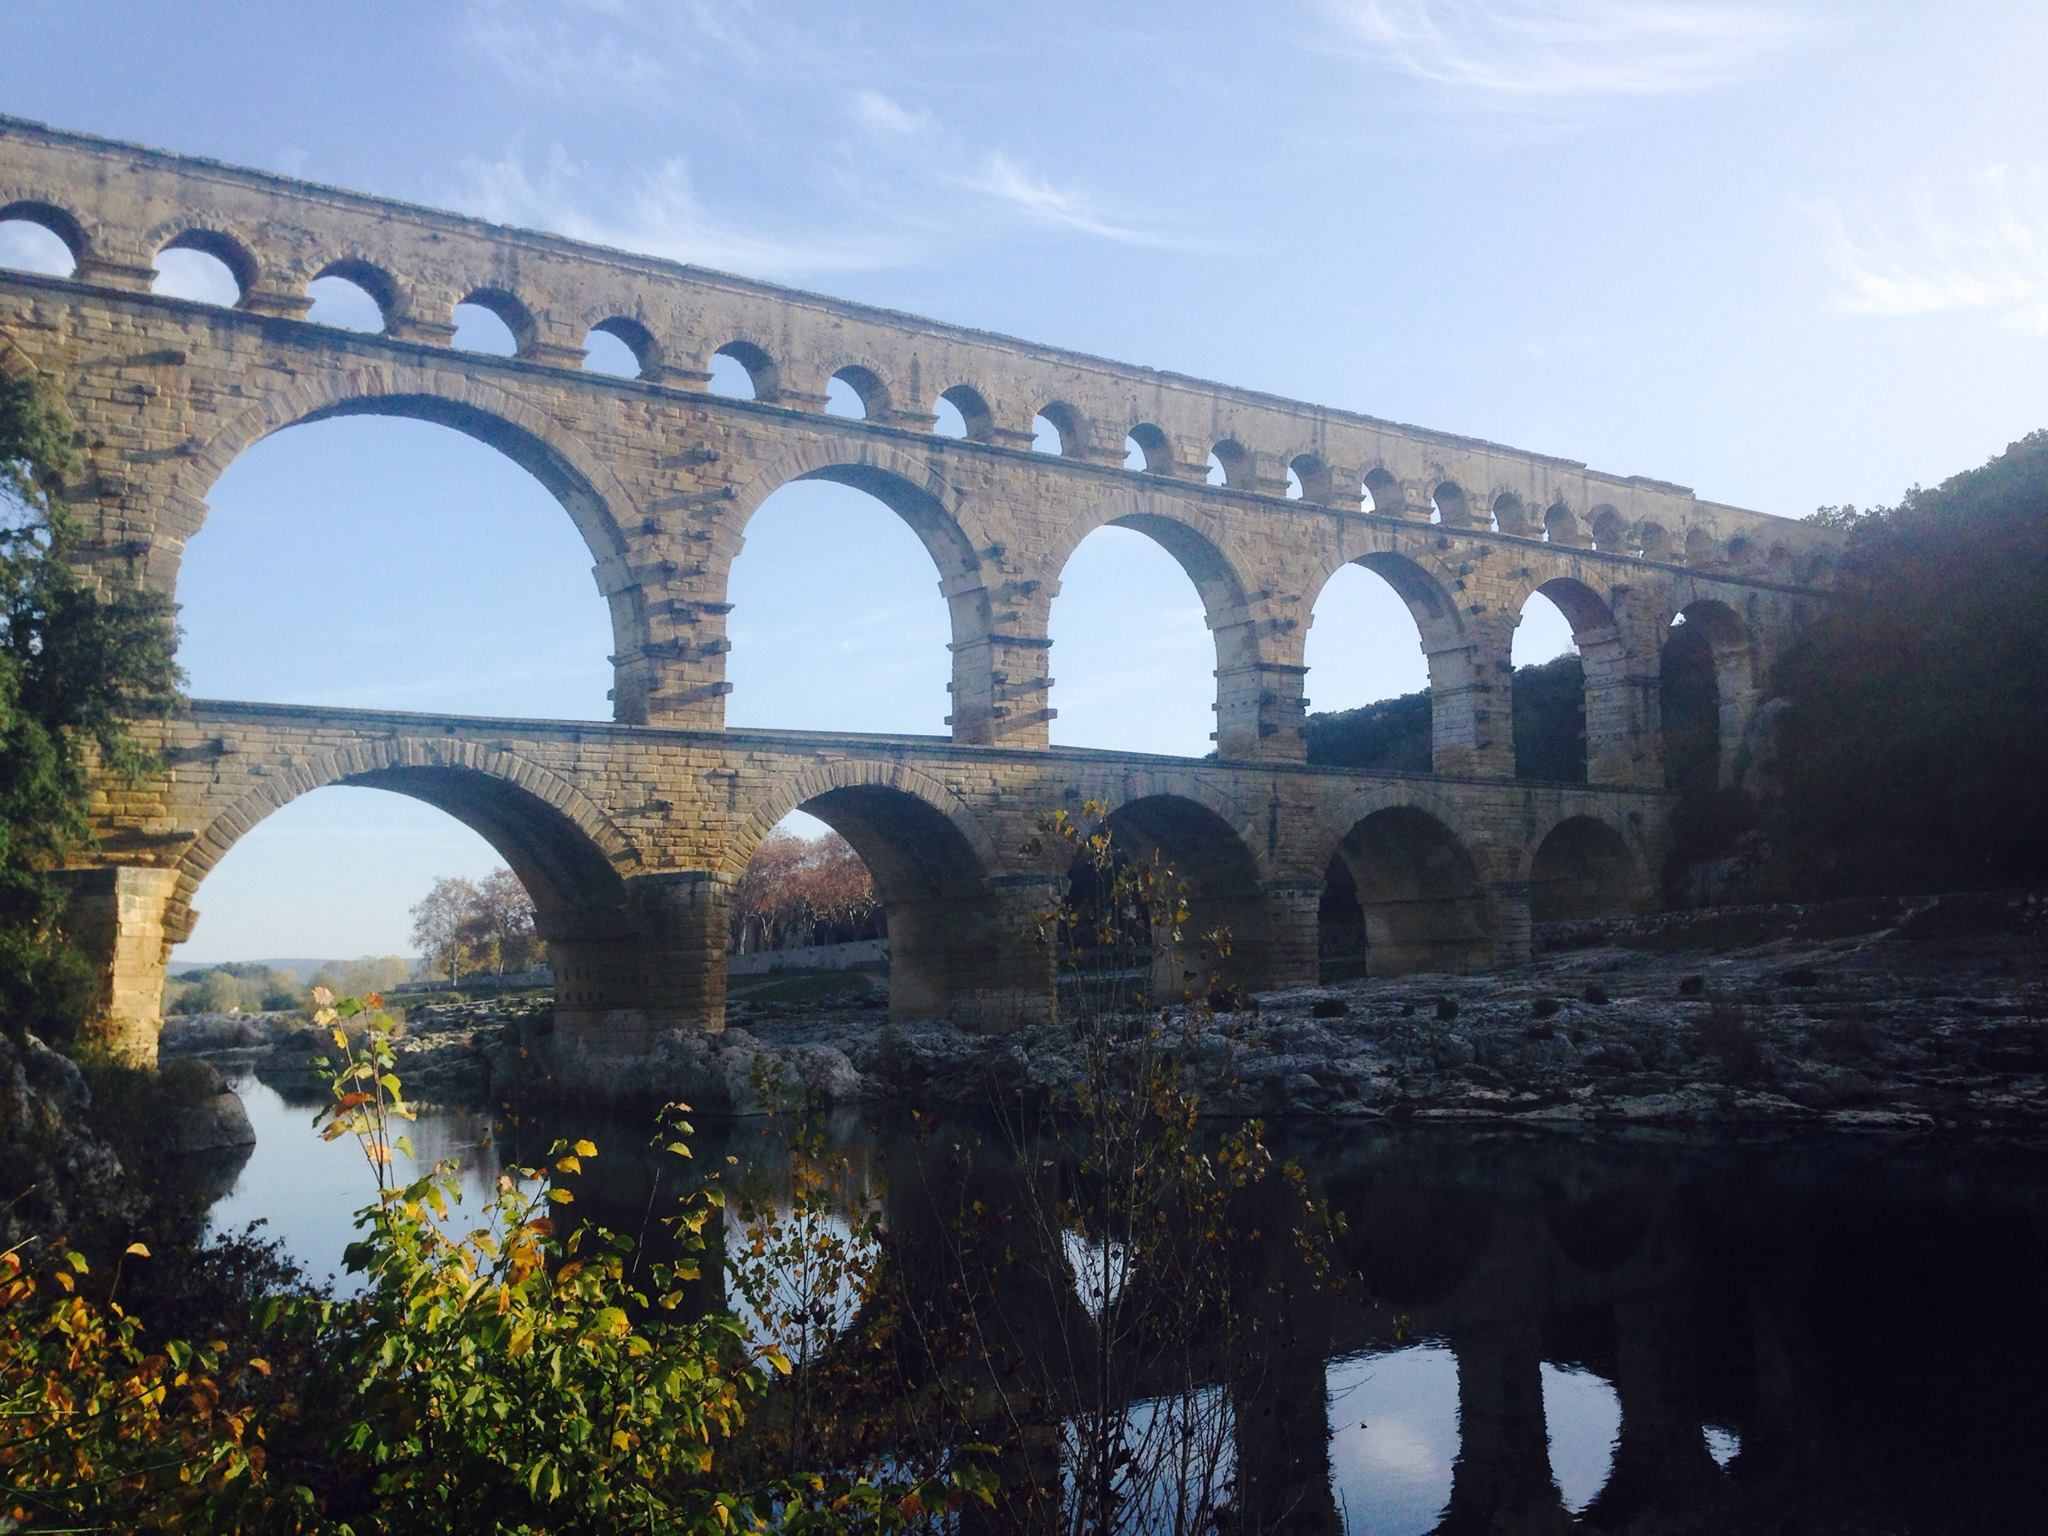 Pont du Gard/Tavel/Chateauneuf du Pape